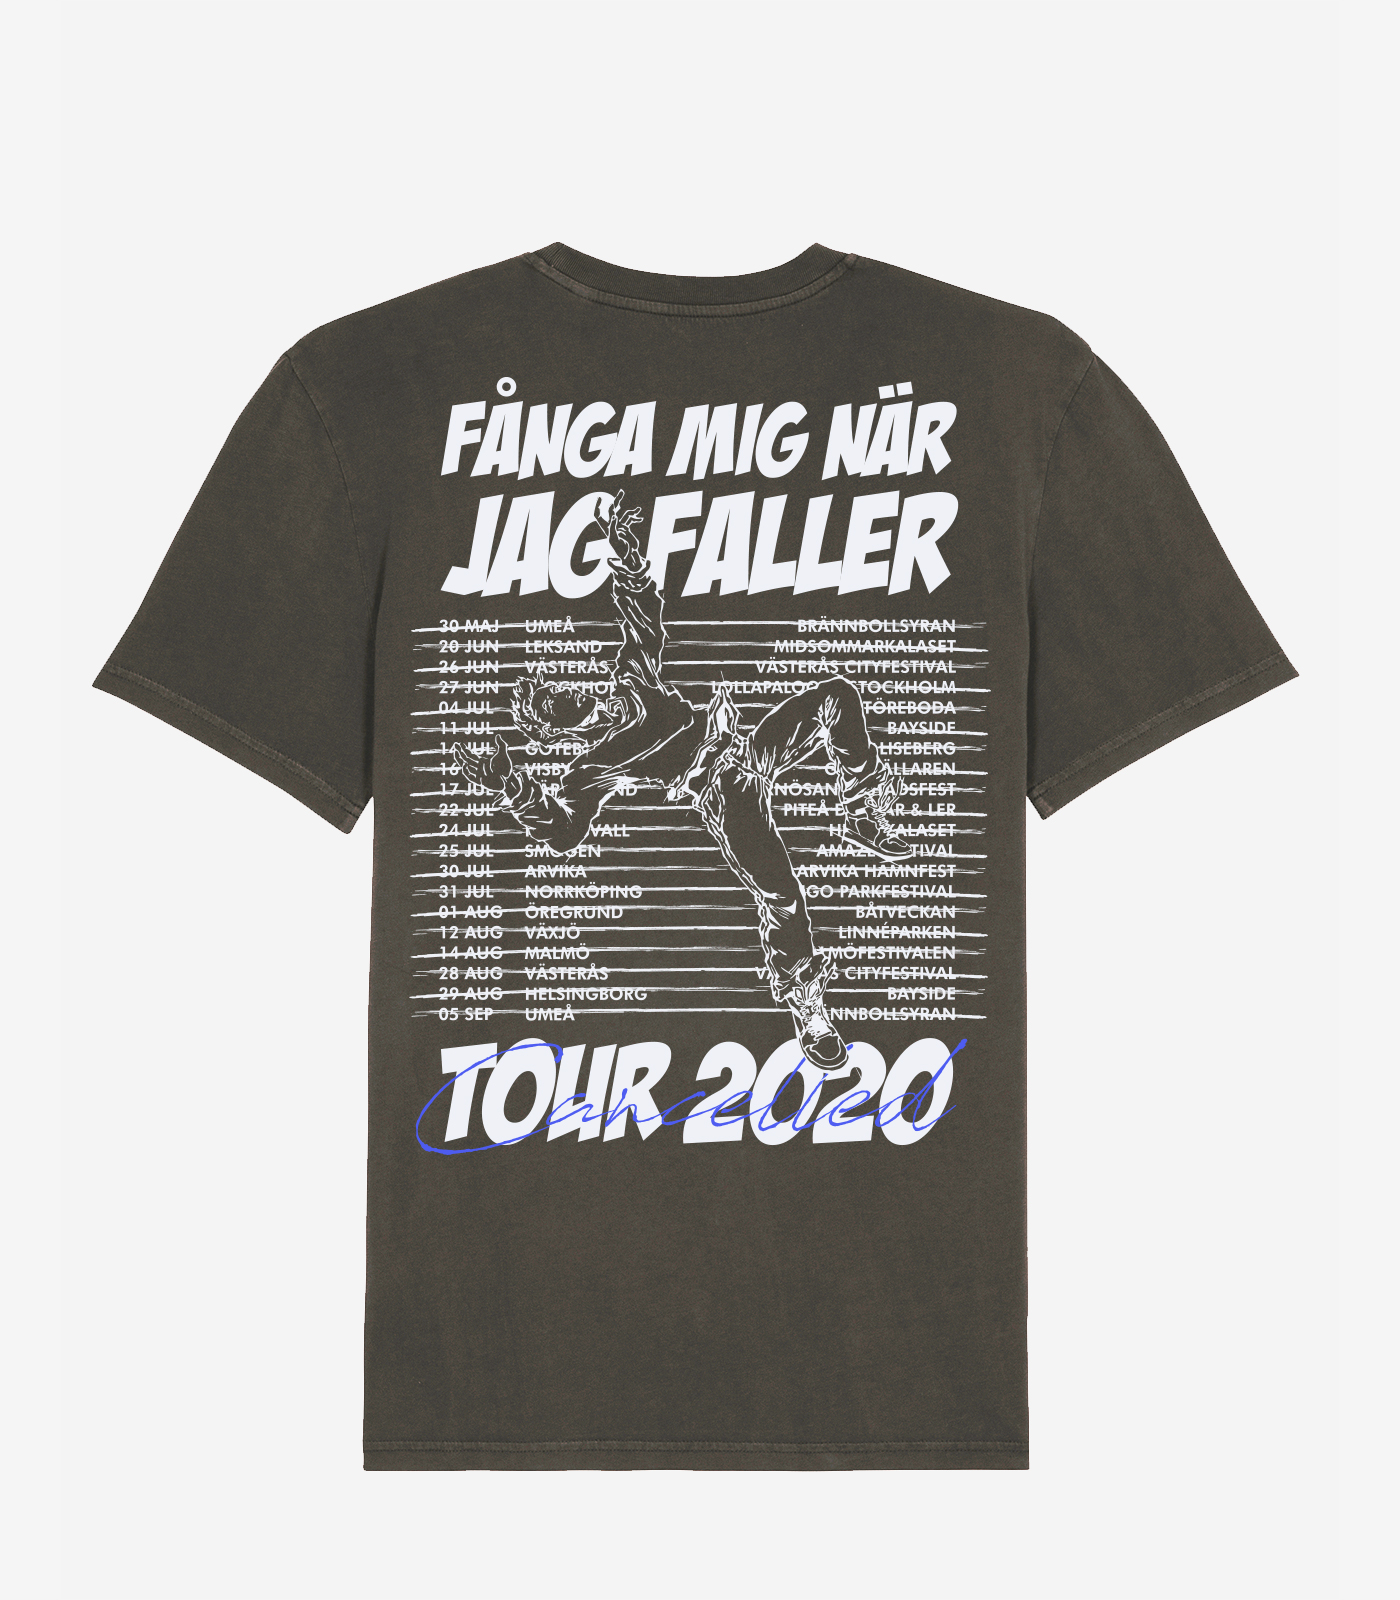 Cancelled Tour 2020 T-shirt